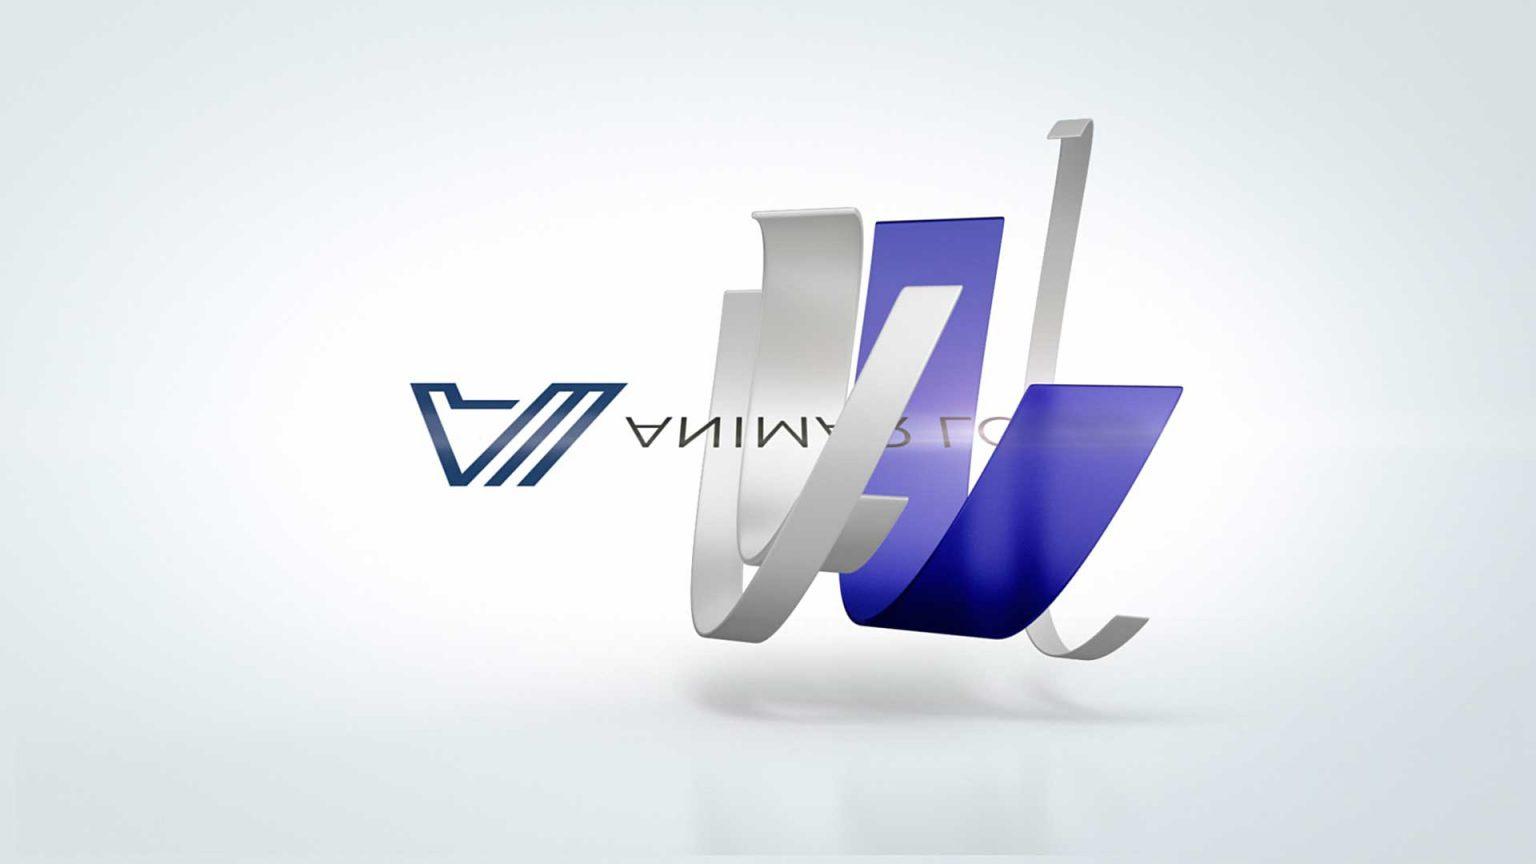 Logo-animado-cintas-AL202-animacion-logotipo-1536x864